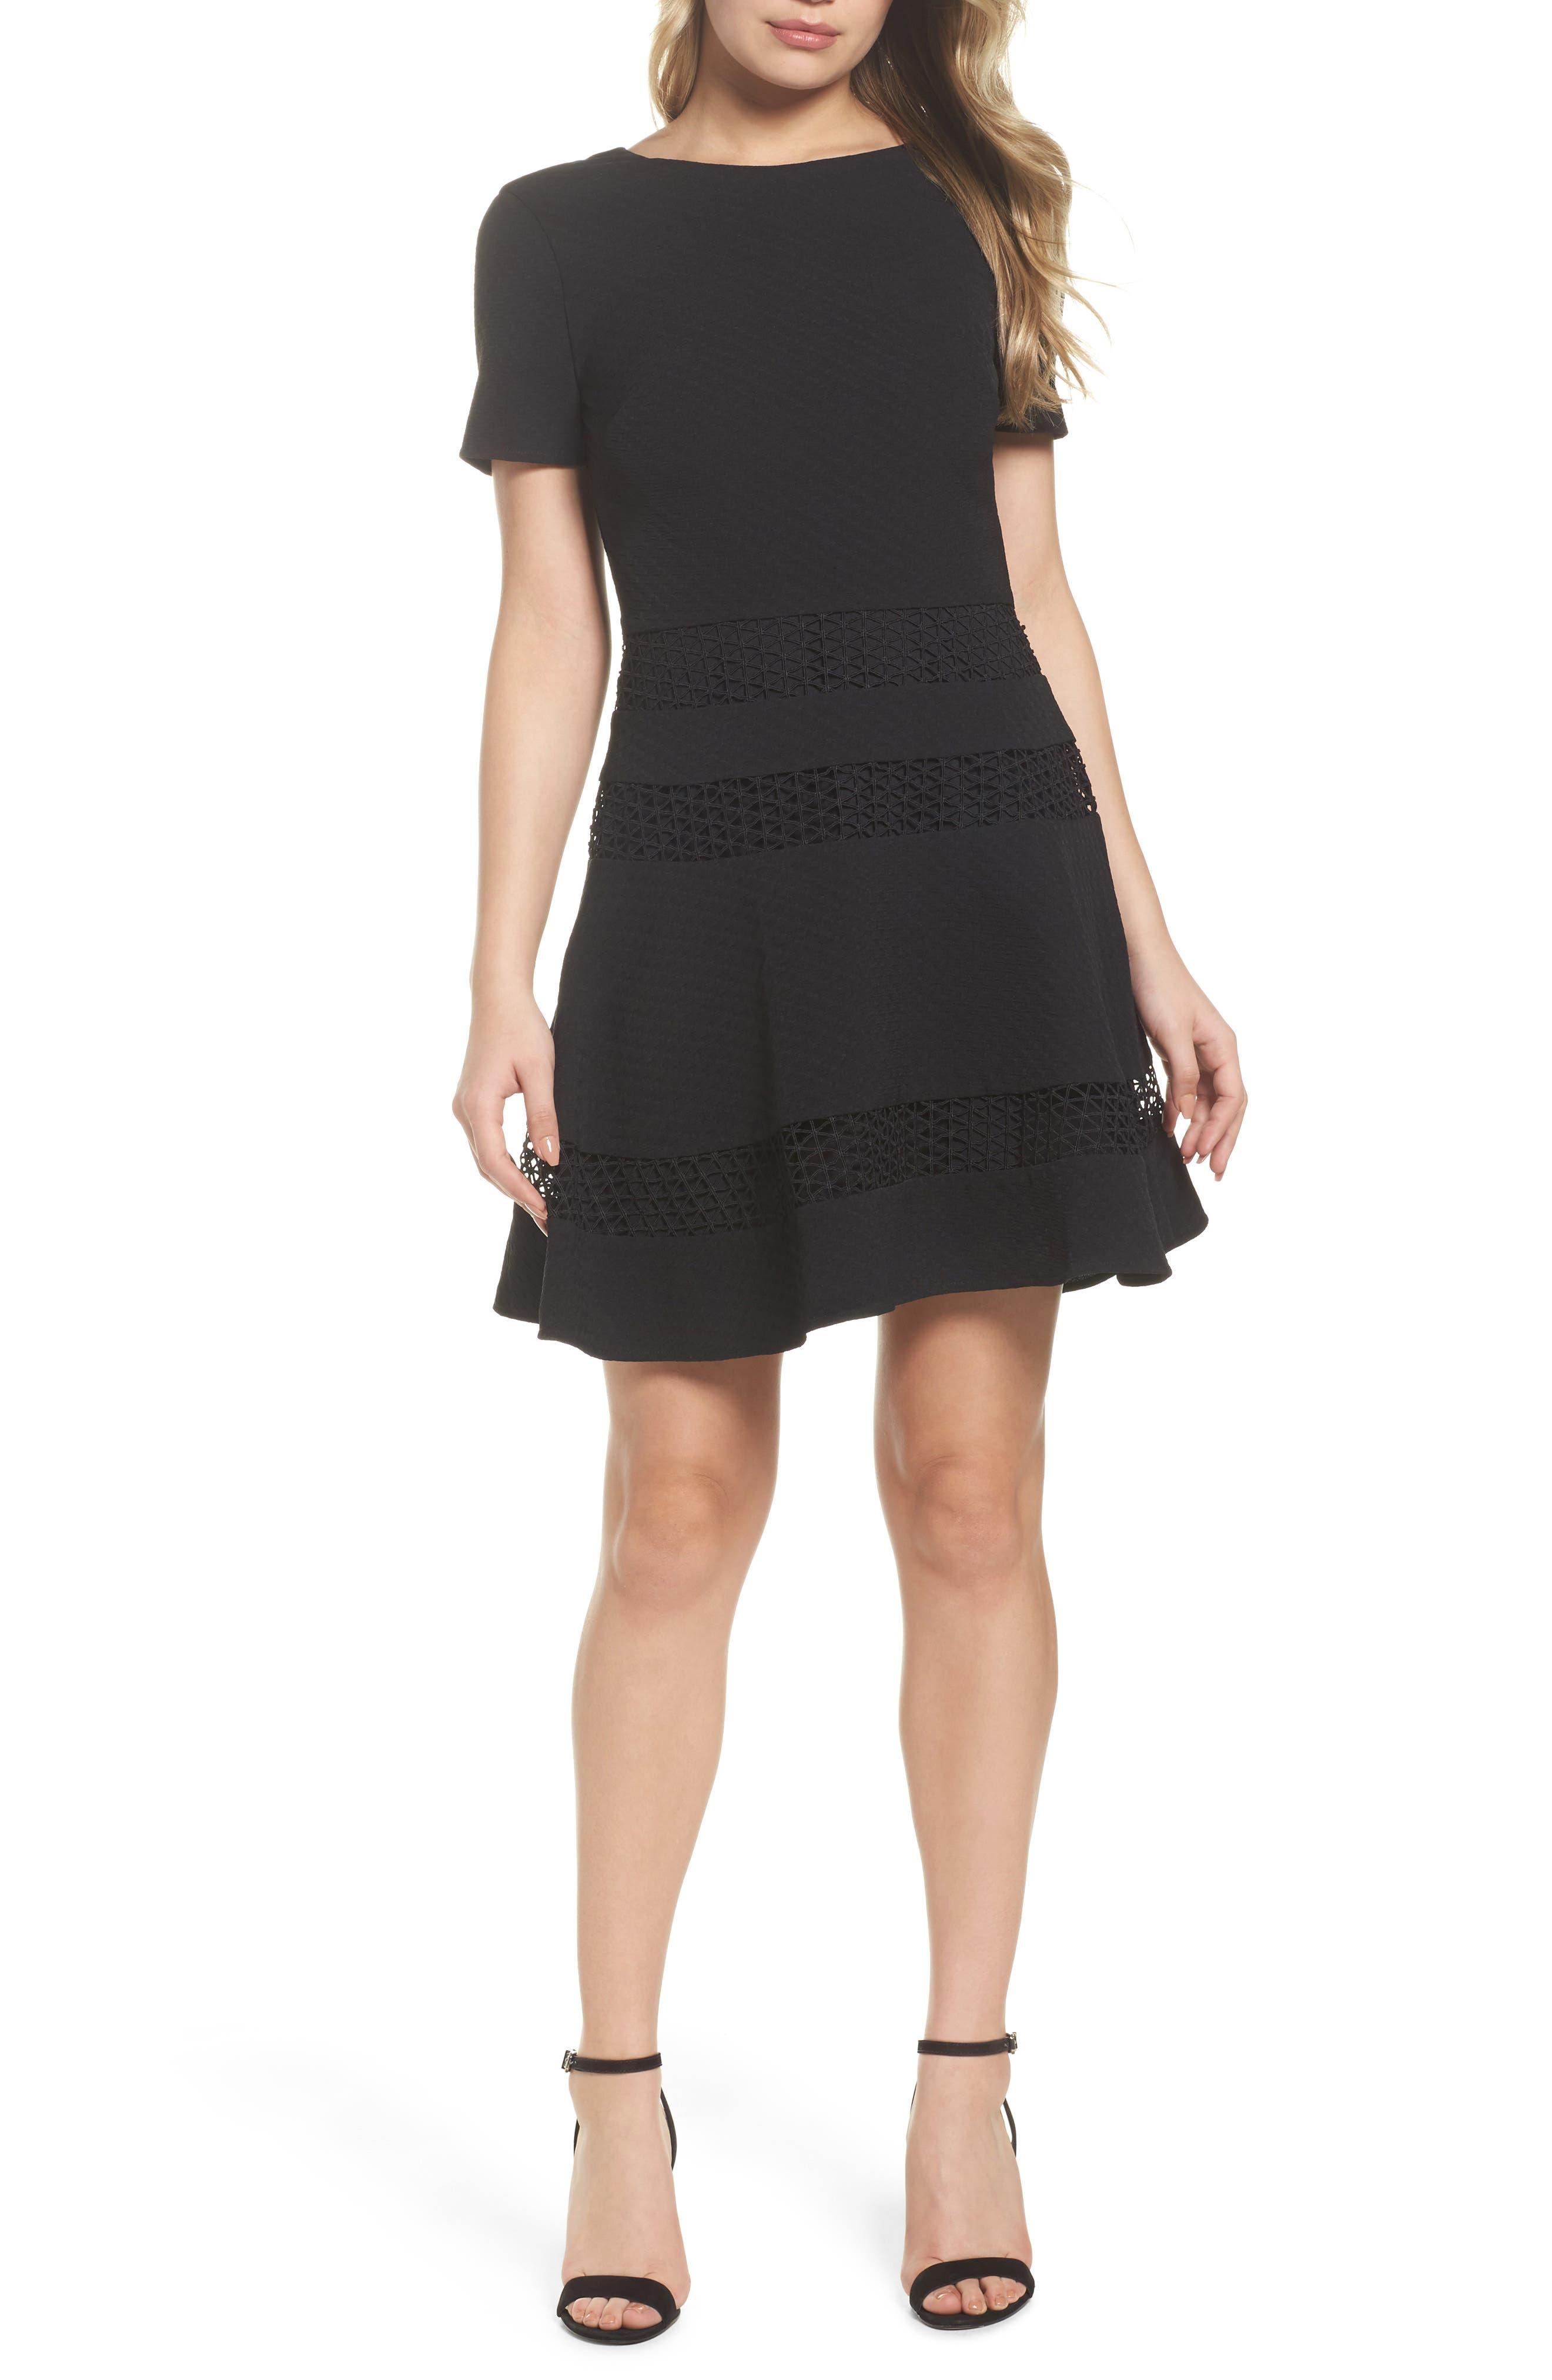 Chelsea28 Mixed Media Fit & Flare Dress, Black